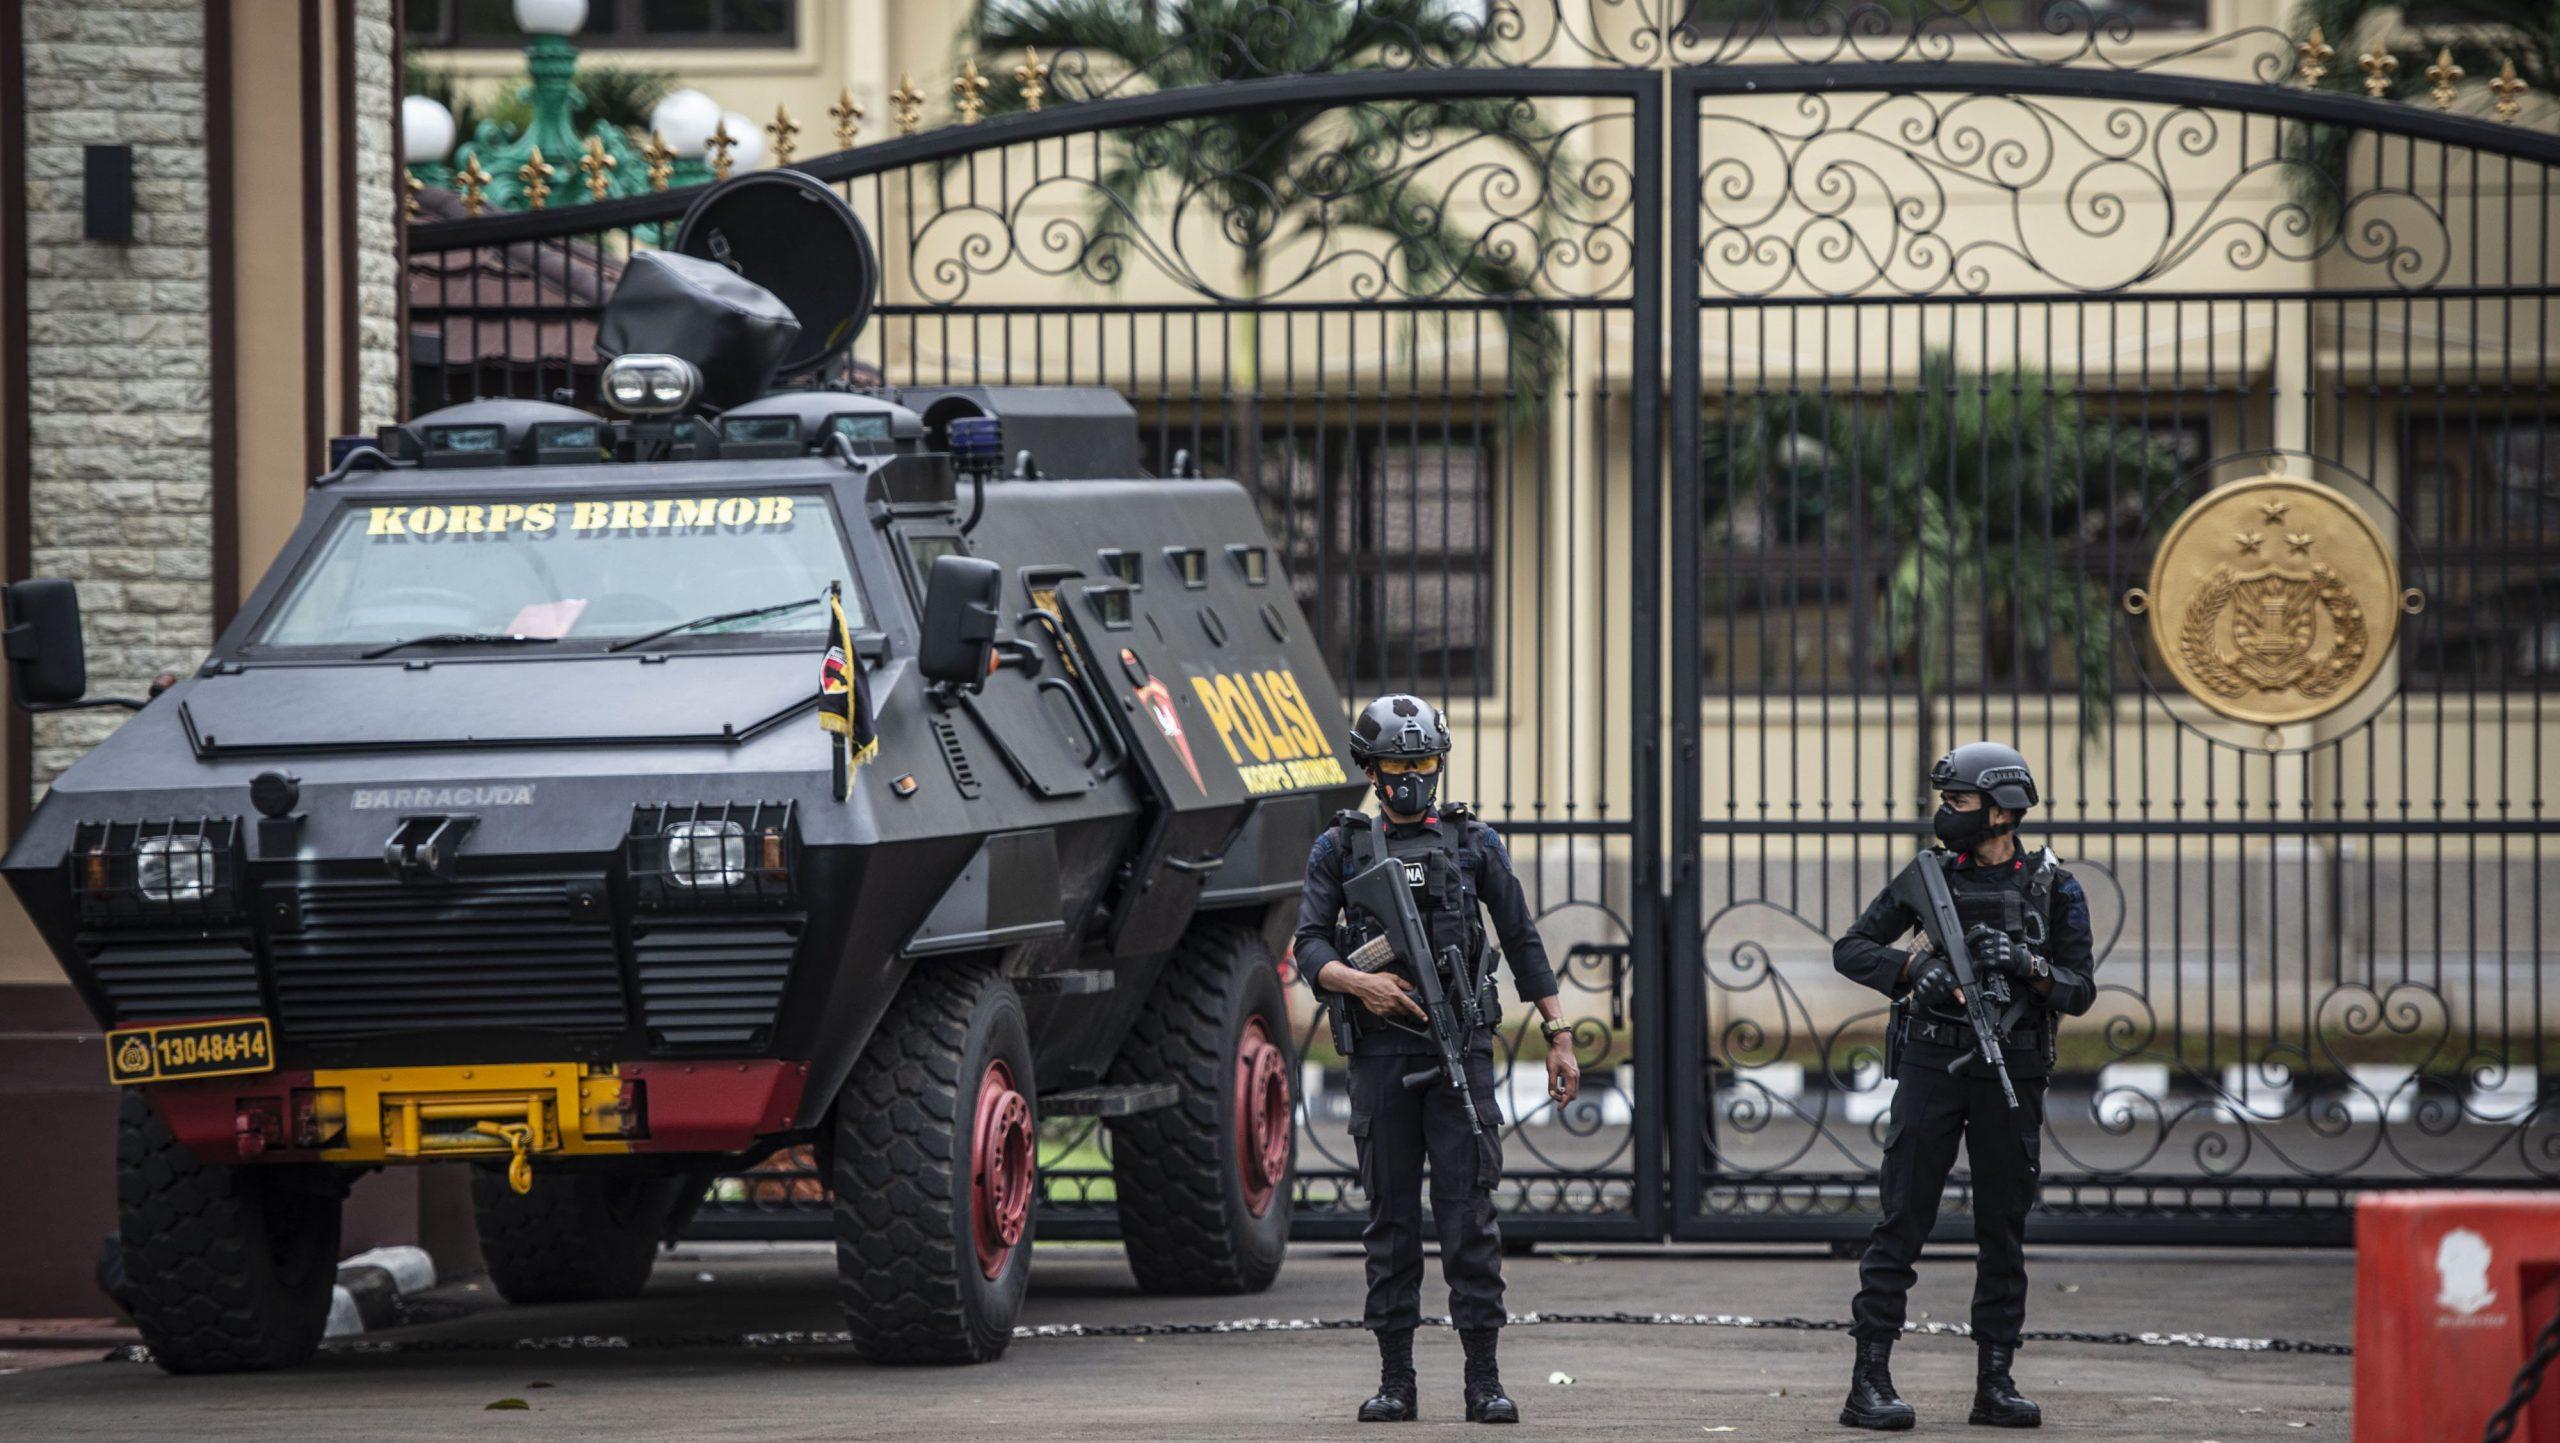 Polri Dituduh Kasus Terorisme Hanya Rekayasa, Direktur Lemkapi Dr. Edi Hasibuan : Ngawur !!